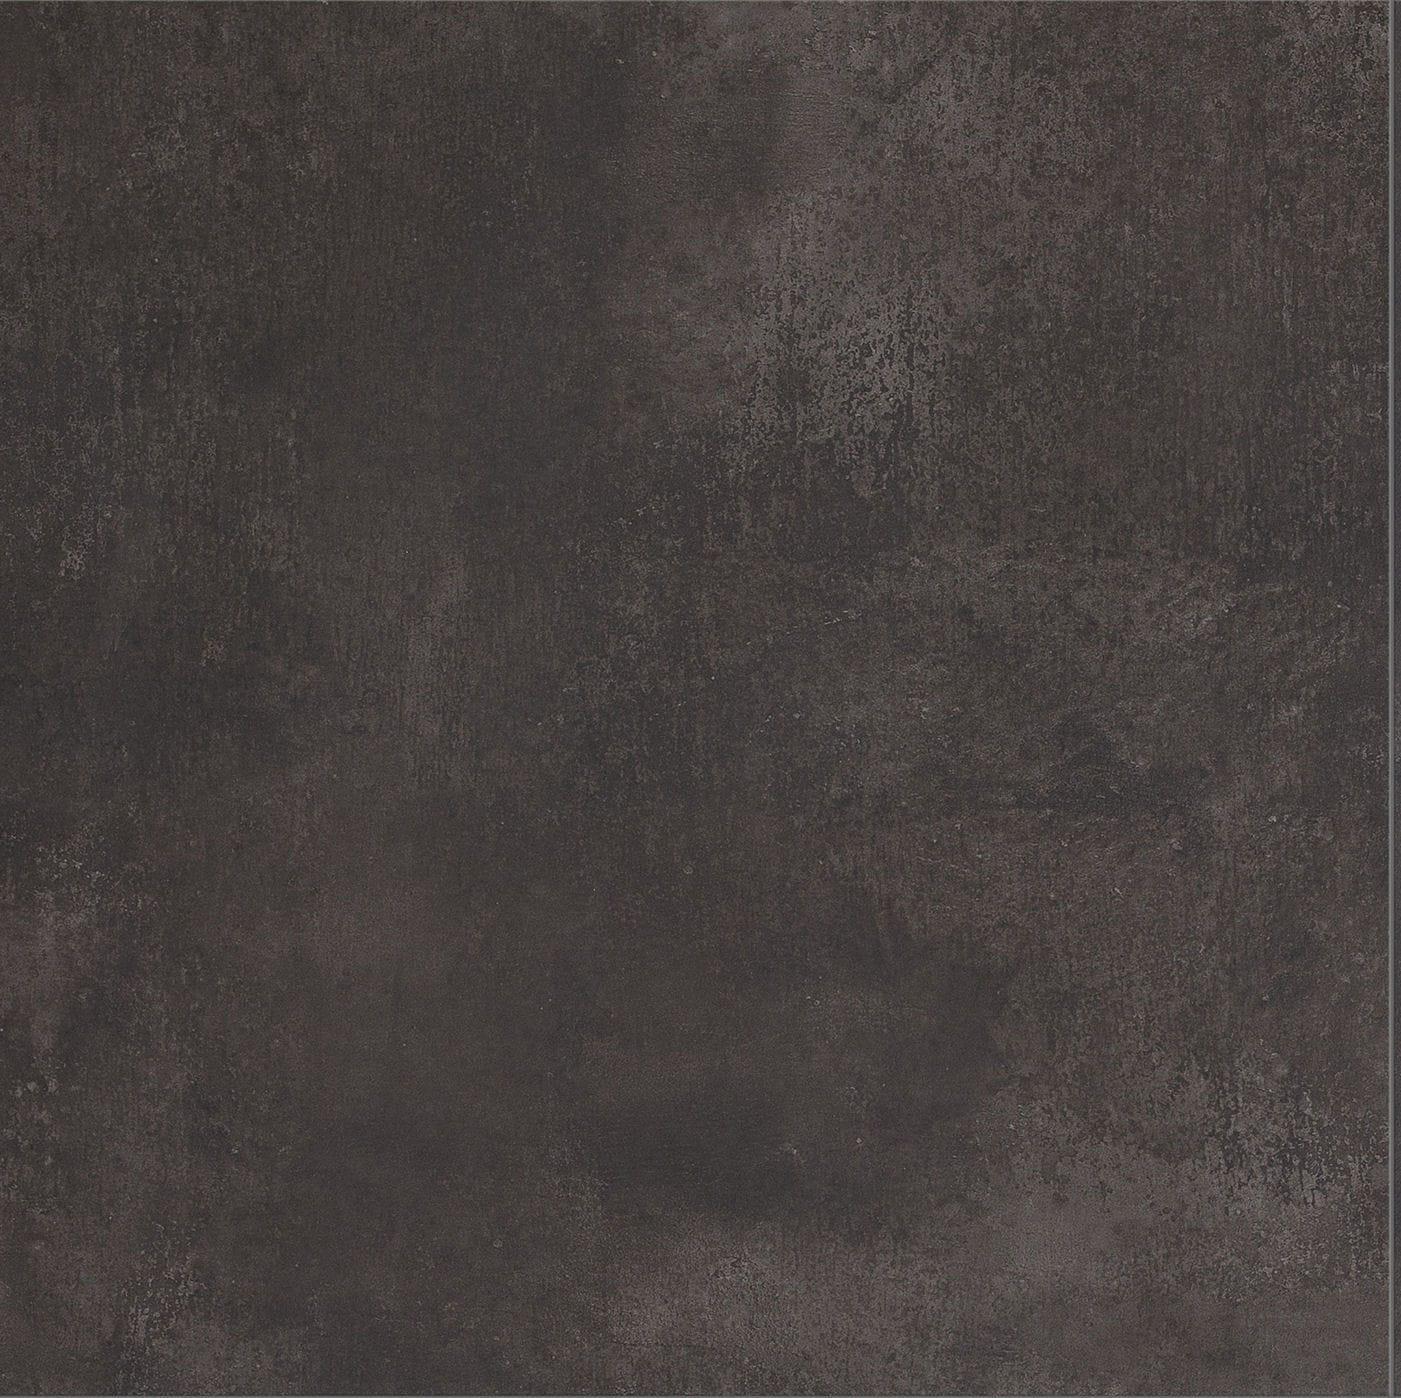 Cemento Dark Grey Polished Porcelain Tiles Mandarin Stone